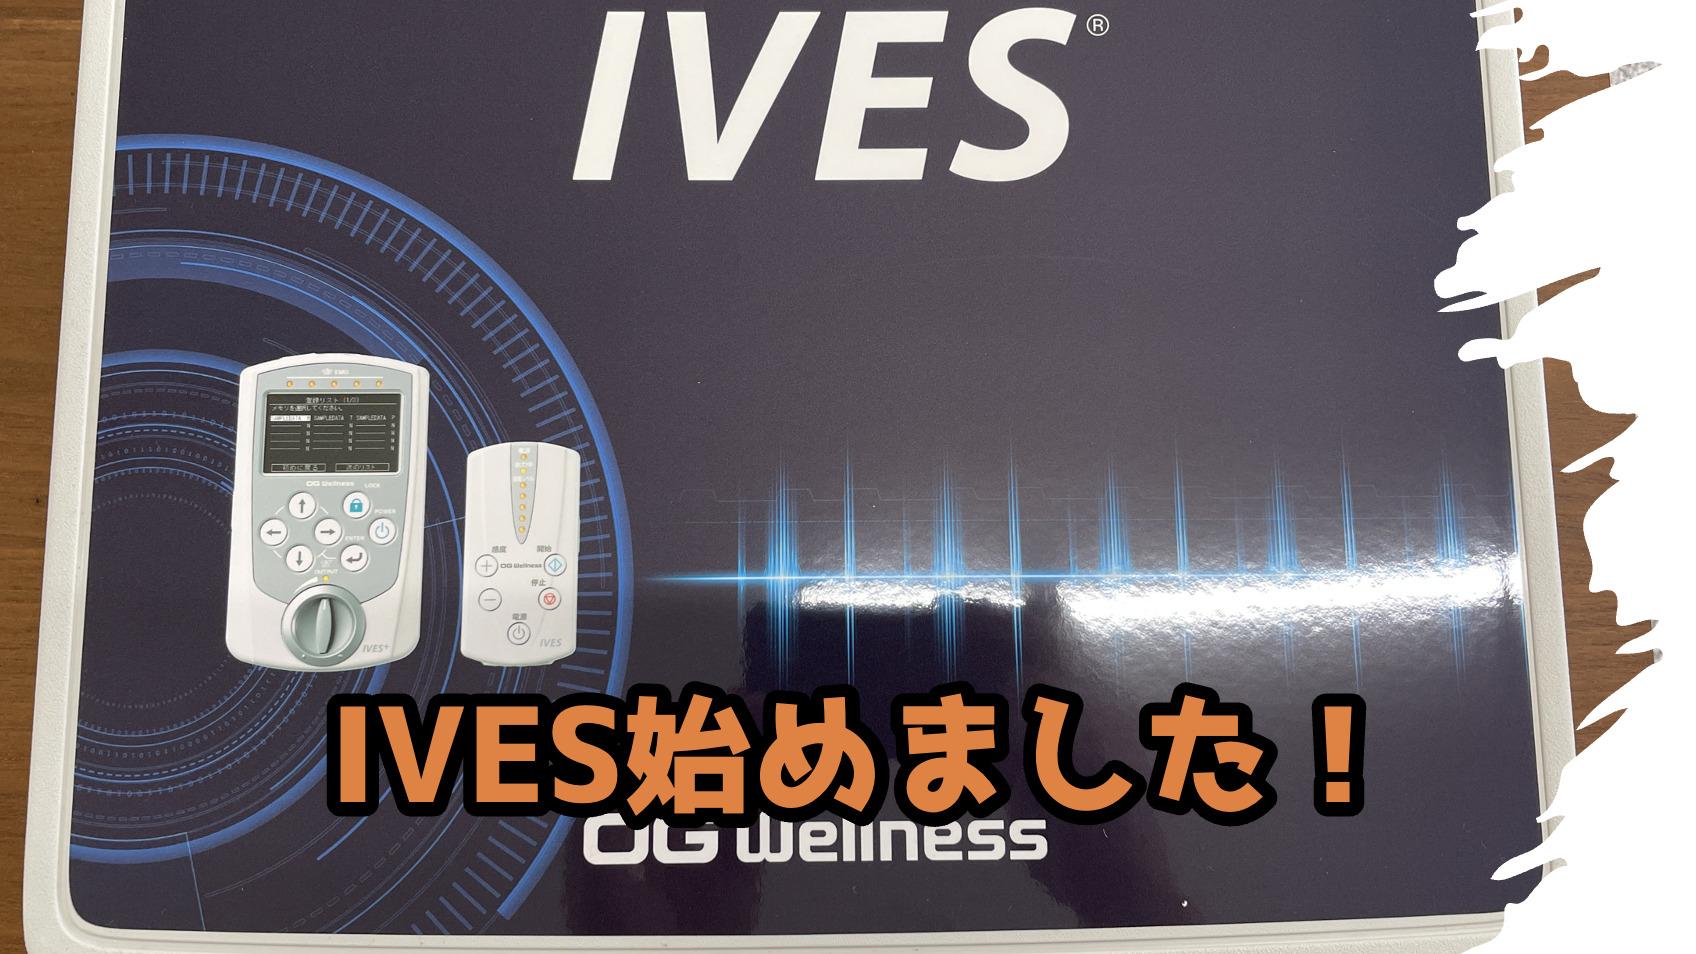 IVES投稿ページアイキャッチ